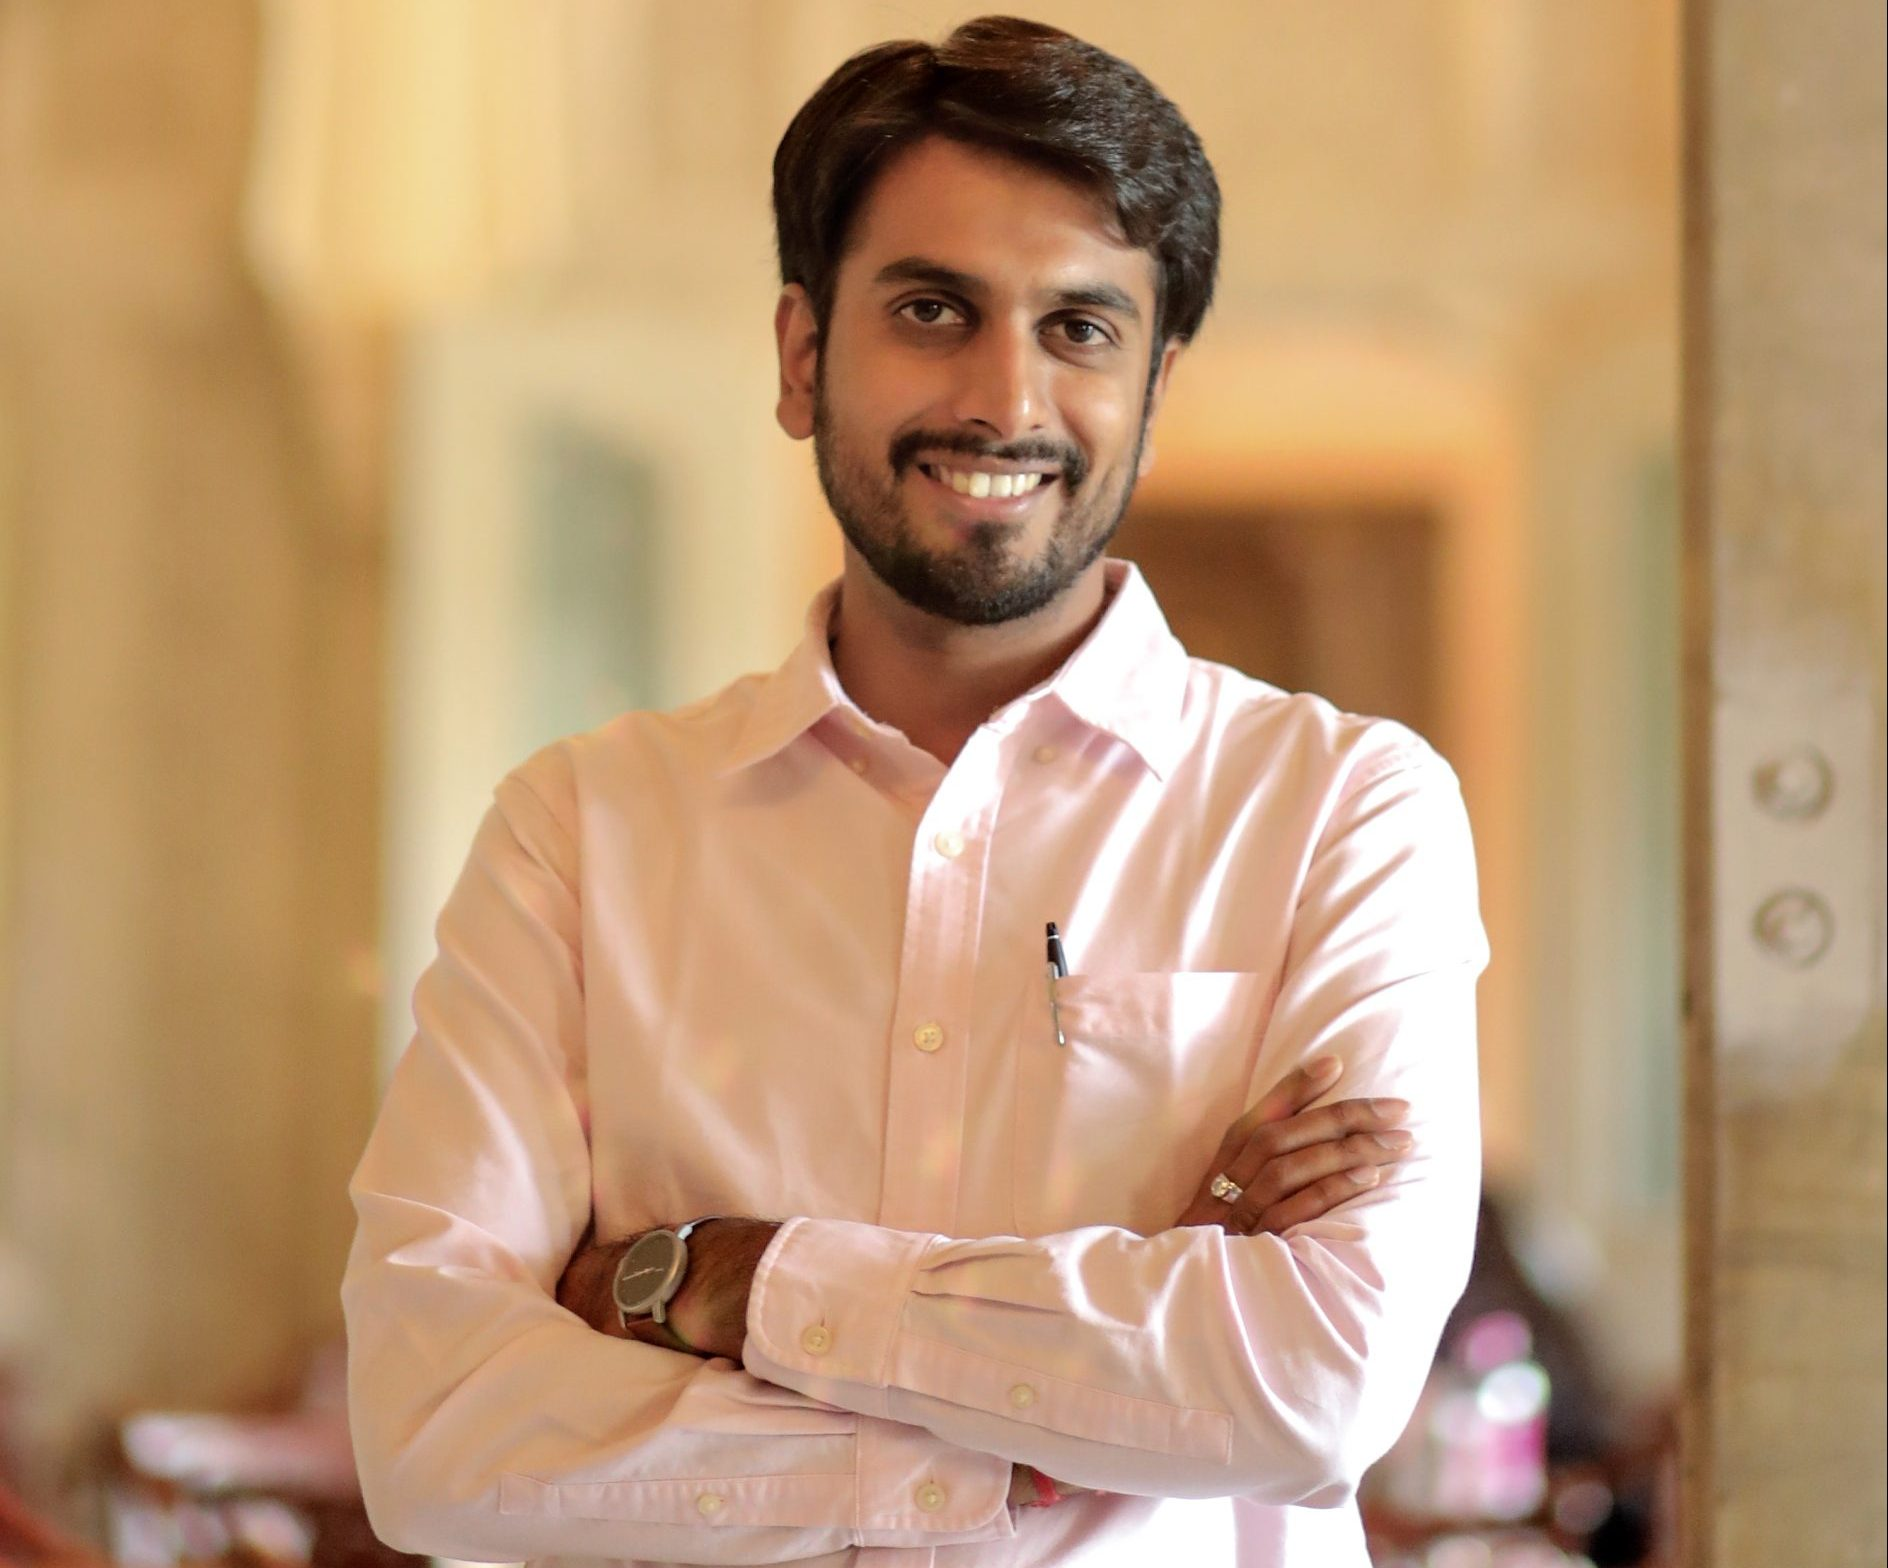 Yogesh Chaudhary, Director, Jaipur Rugs